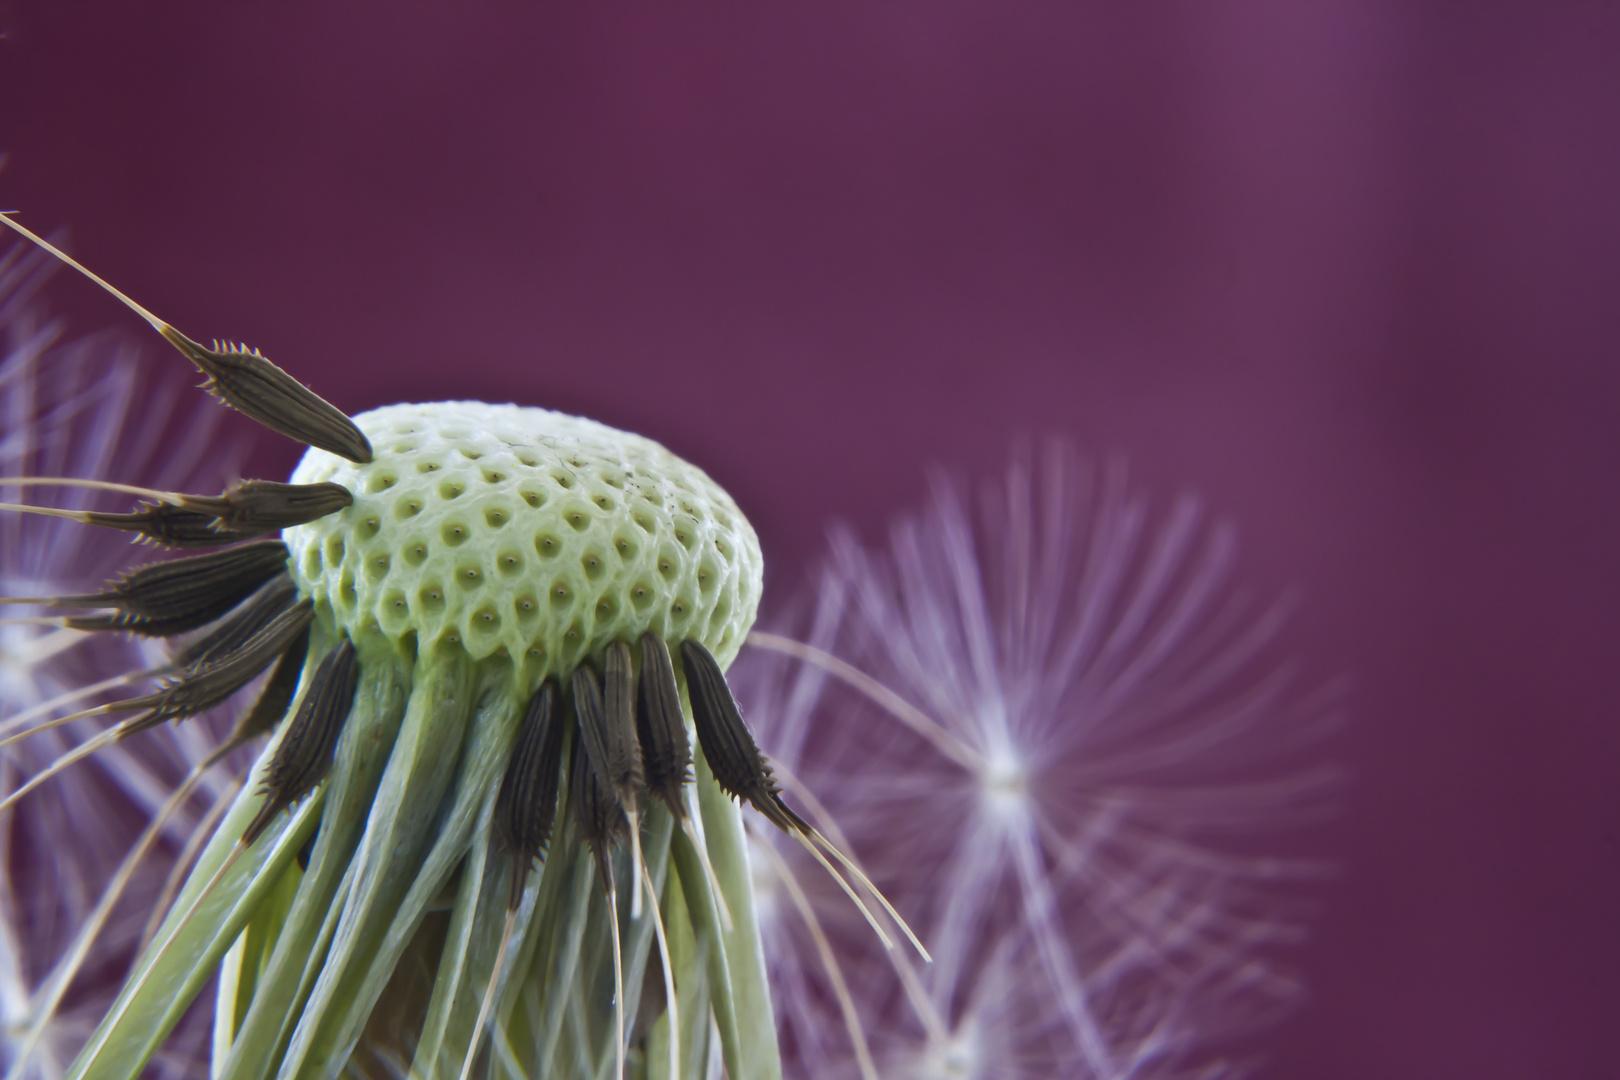 ne pusteblume foto bild pflanzen pilze flechten bl ten kleinpflanzen l wenzahn. Black Bedroom Furniture Sets. Home Design Ideas